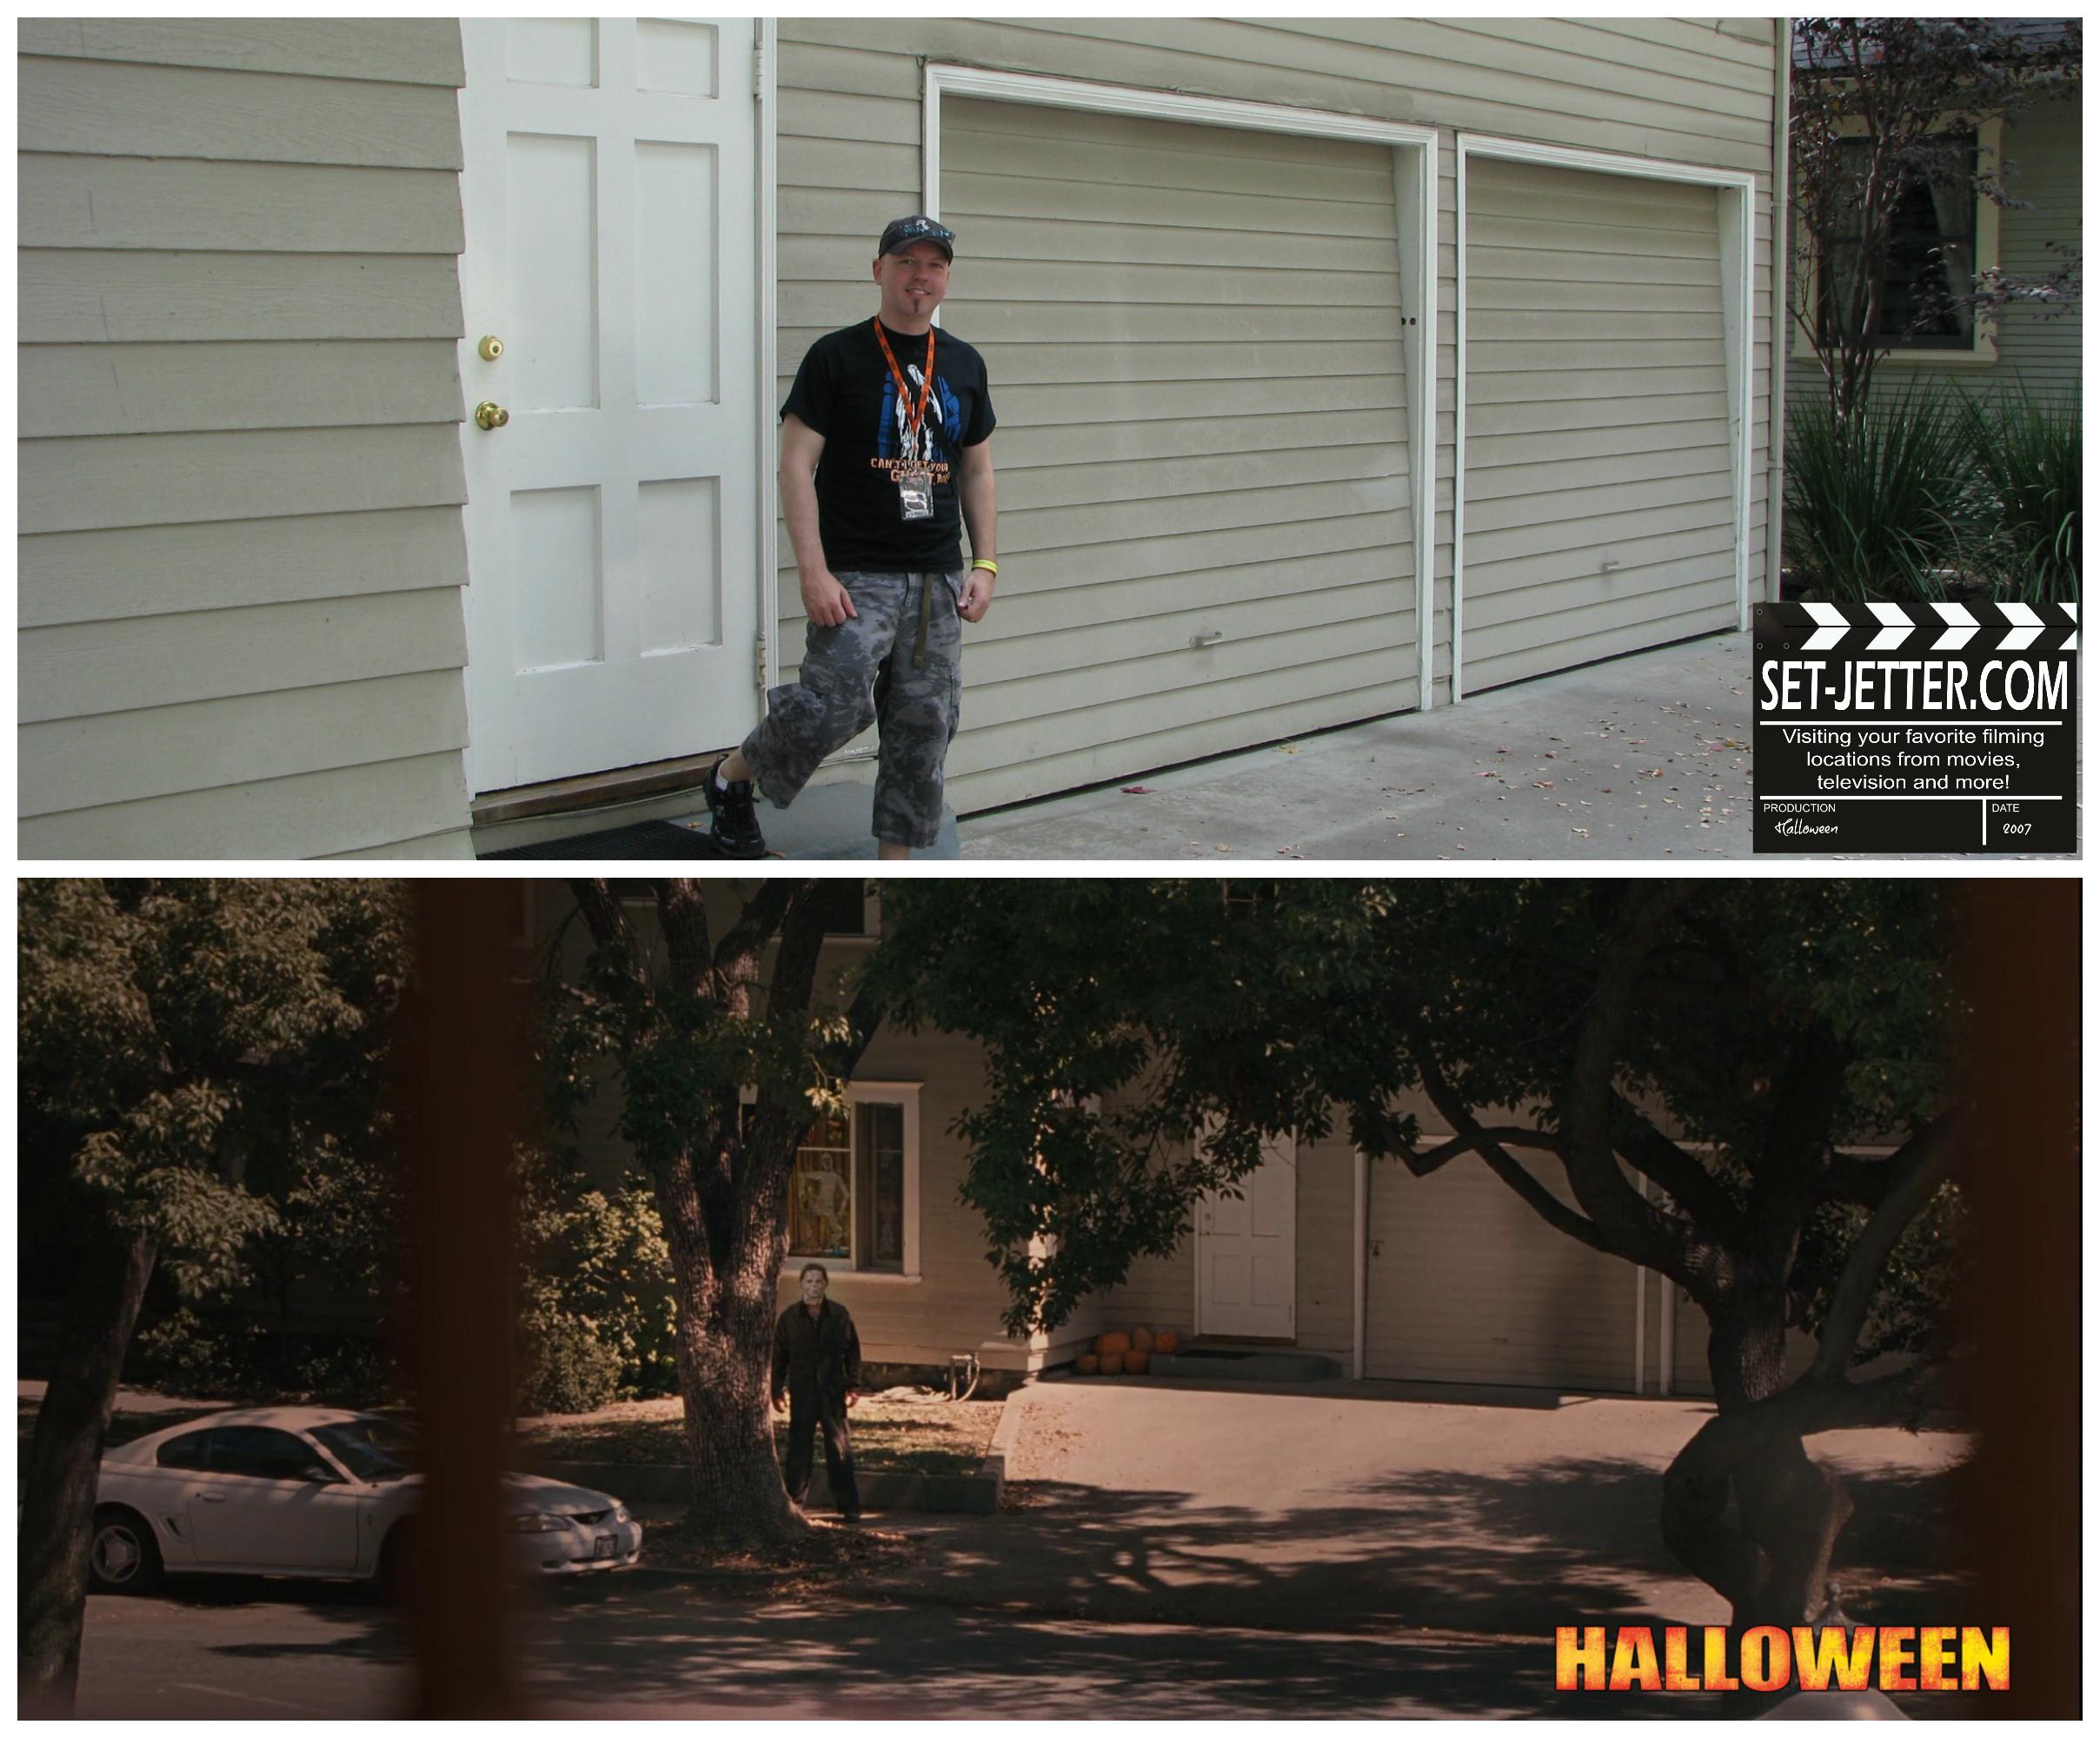 Halloween 2007 comparison 44.jpg